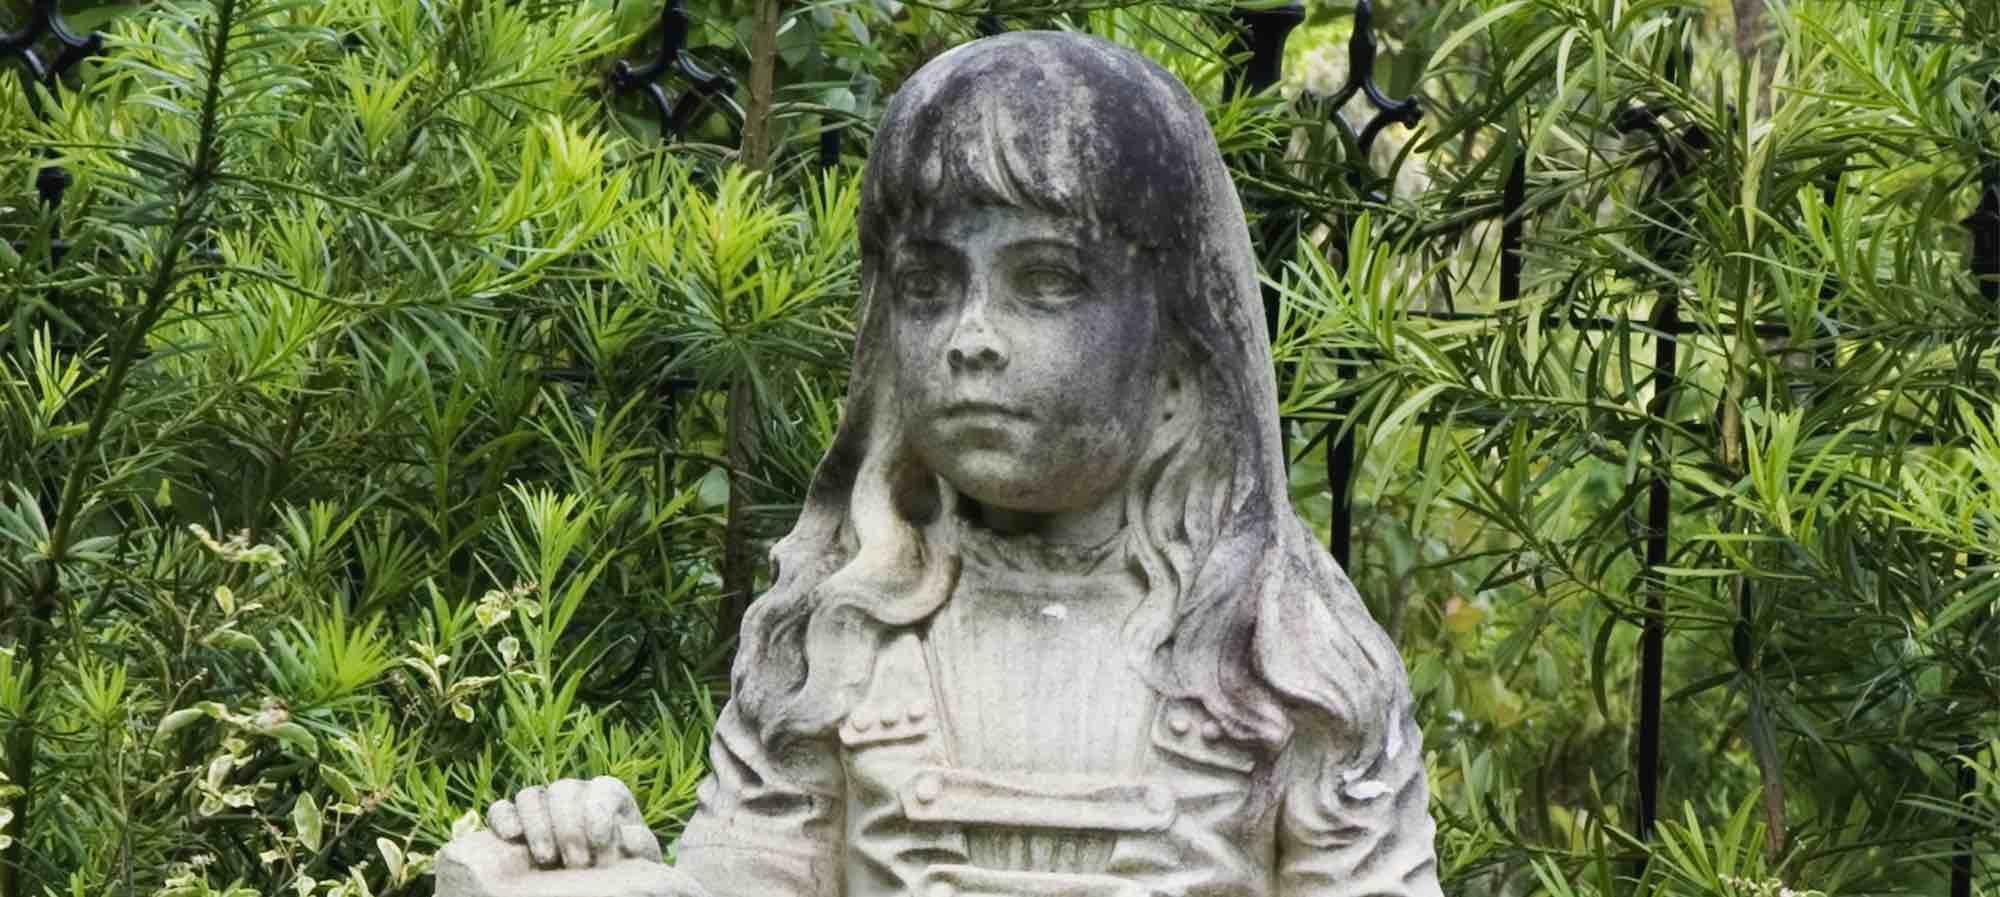 Statue of Gracie Watson in Bonaventure Cemetery, Savannah, GA.